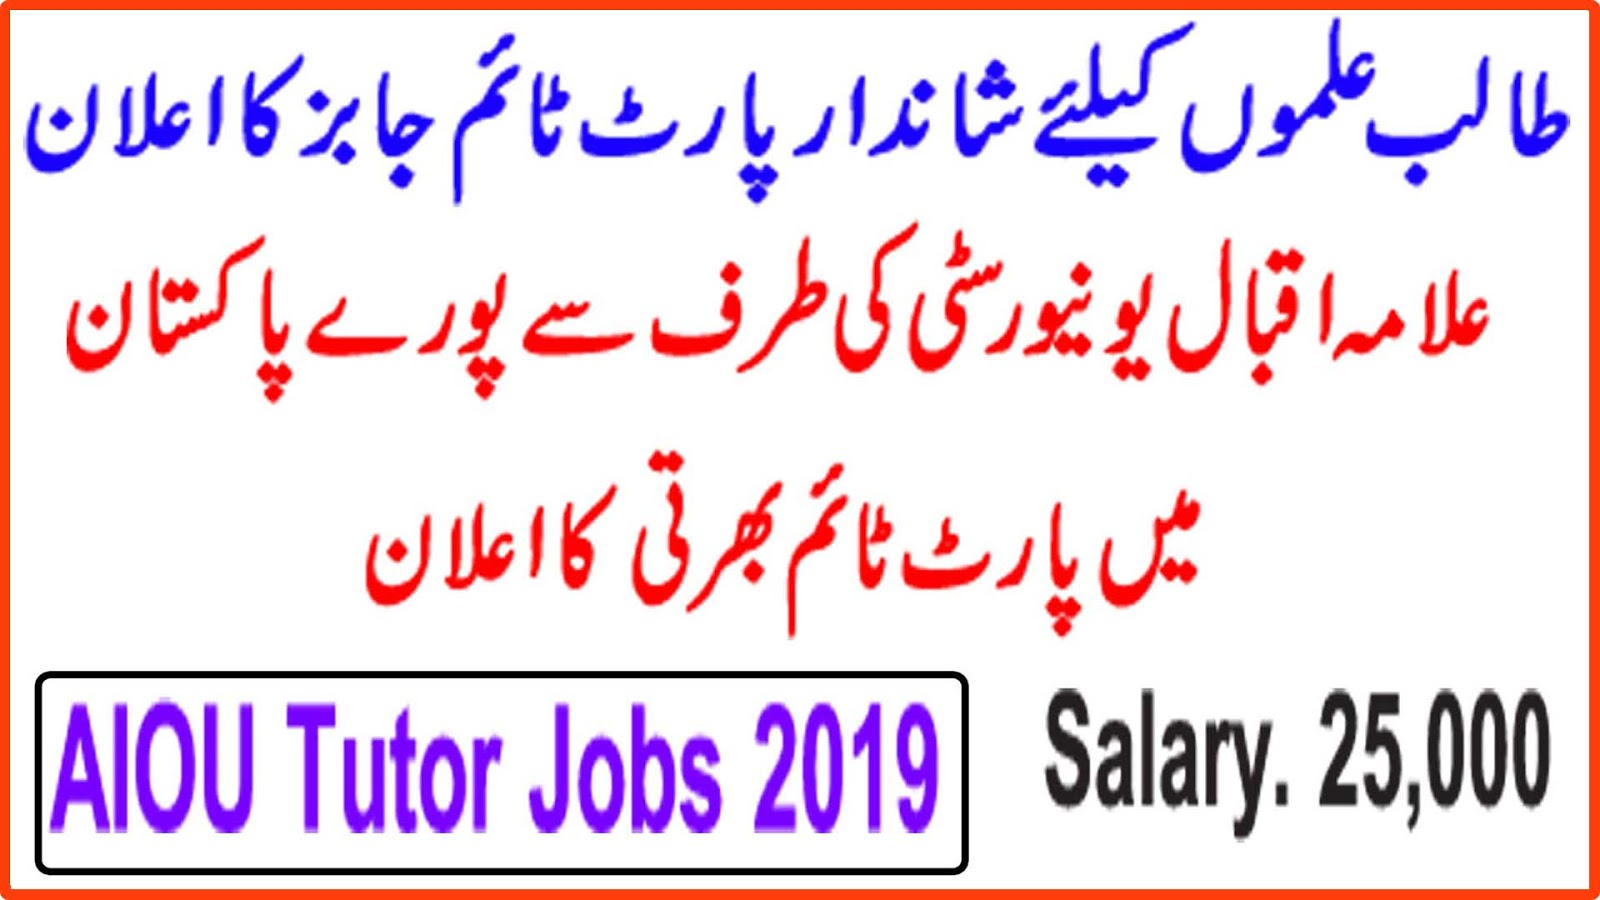 AIOU Tutorship Jobs 2019 Online Eregistration Jobs Online